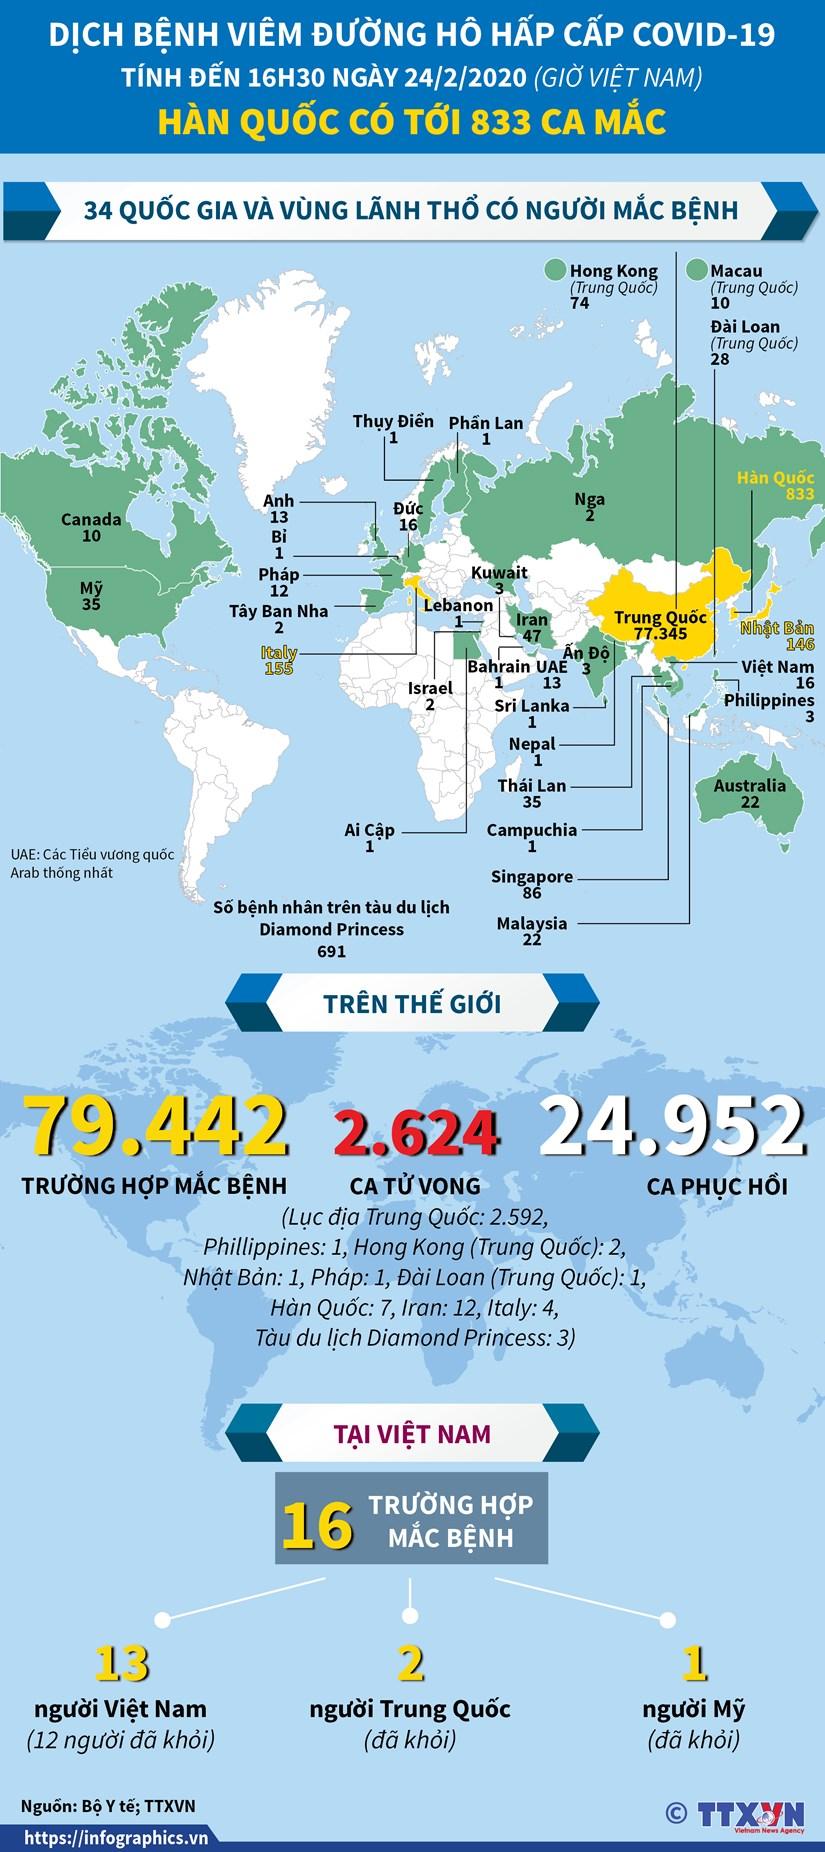 [Infographics] Gan 80.000 ca mac benh viem duong ho hap cap COVID-19 hinh anh 1